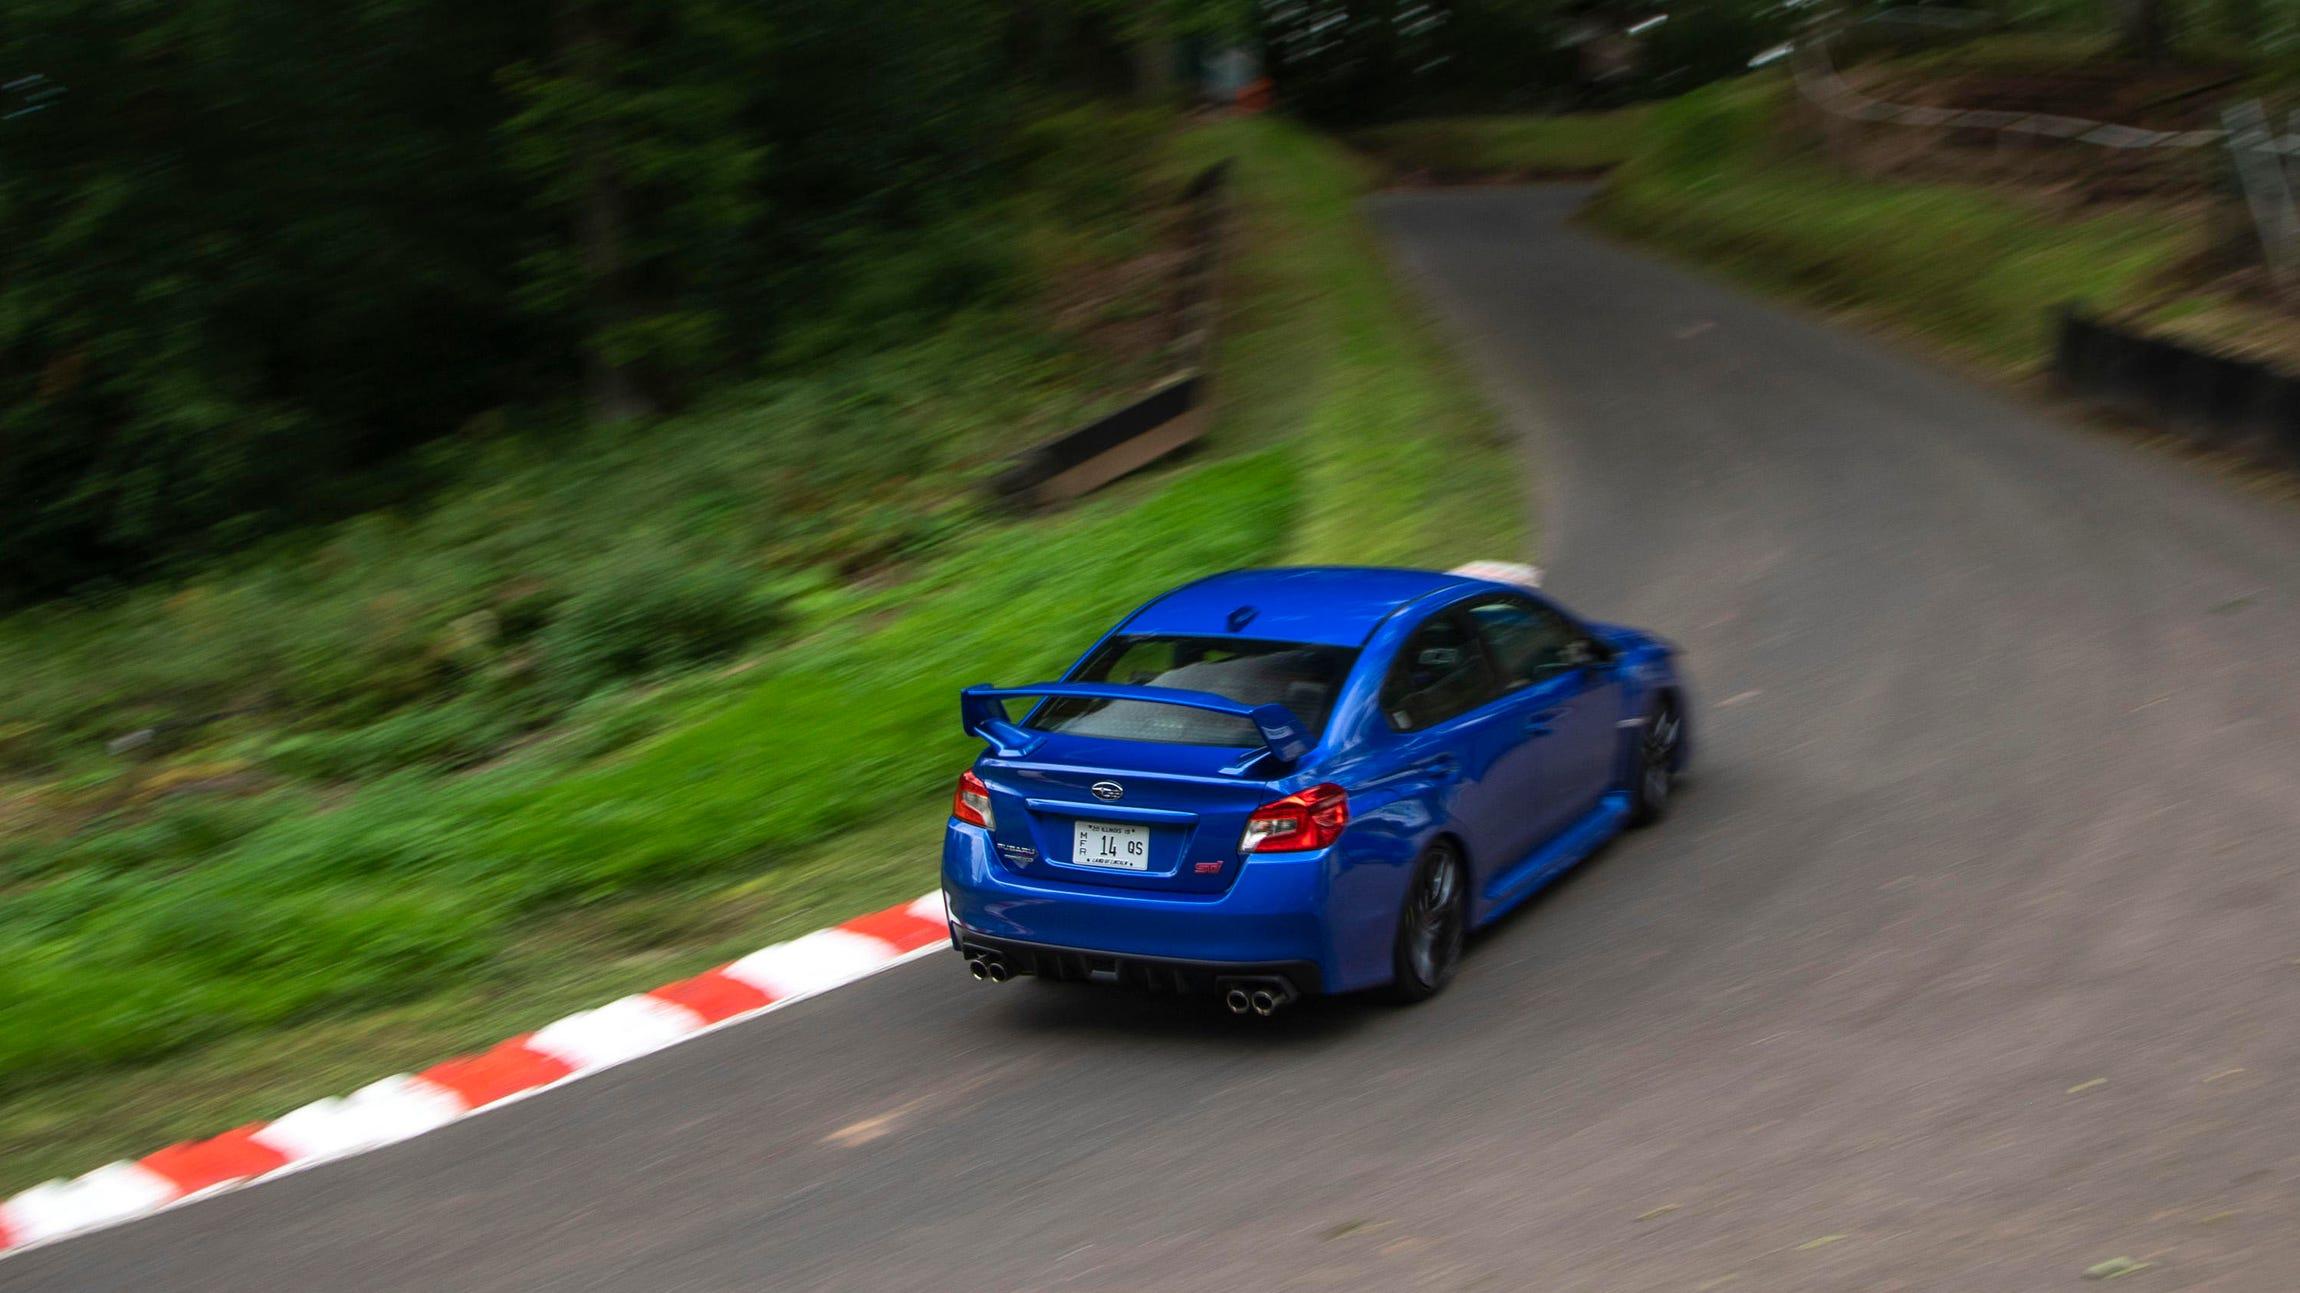 Subaru WRX STI at Shelsley Walsh